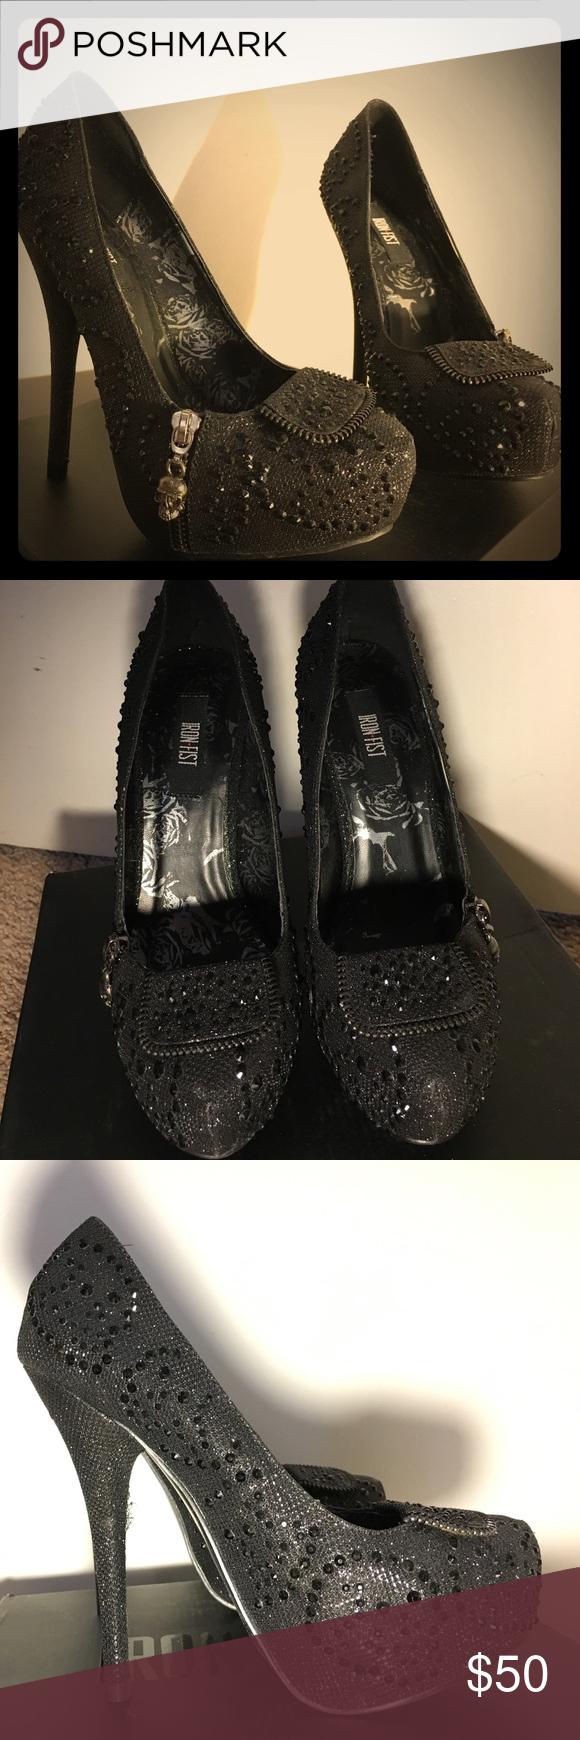 5247cd6c4d4 Iron First - Dark Crystal Platform Heels These authentic